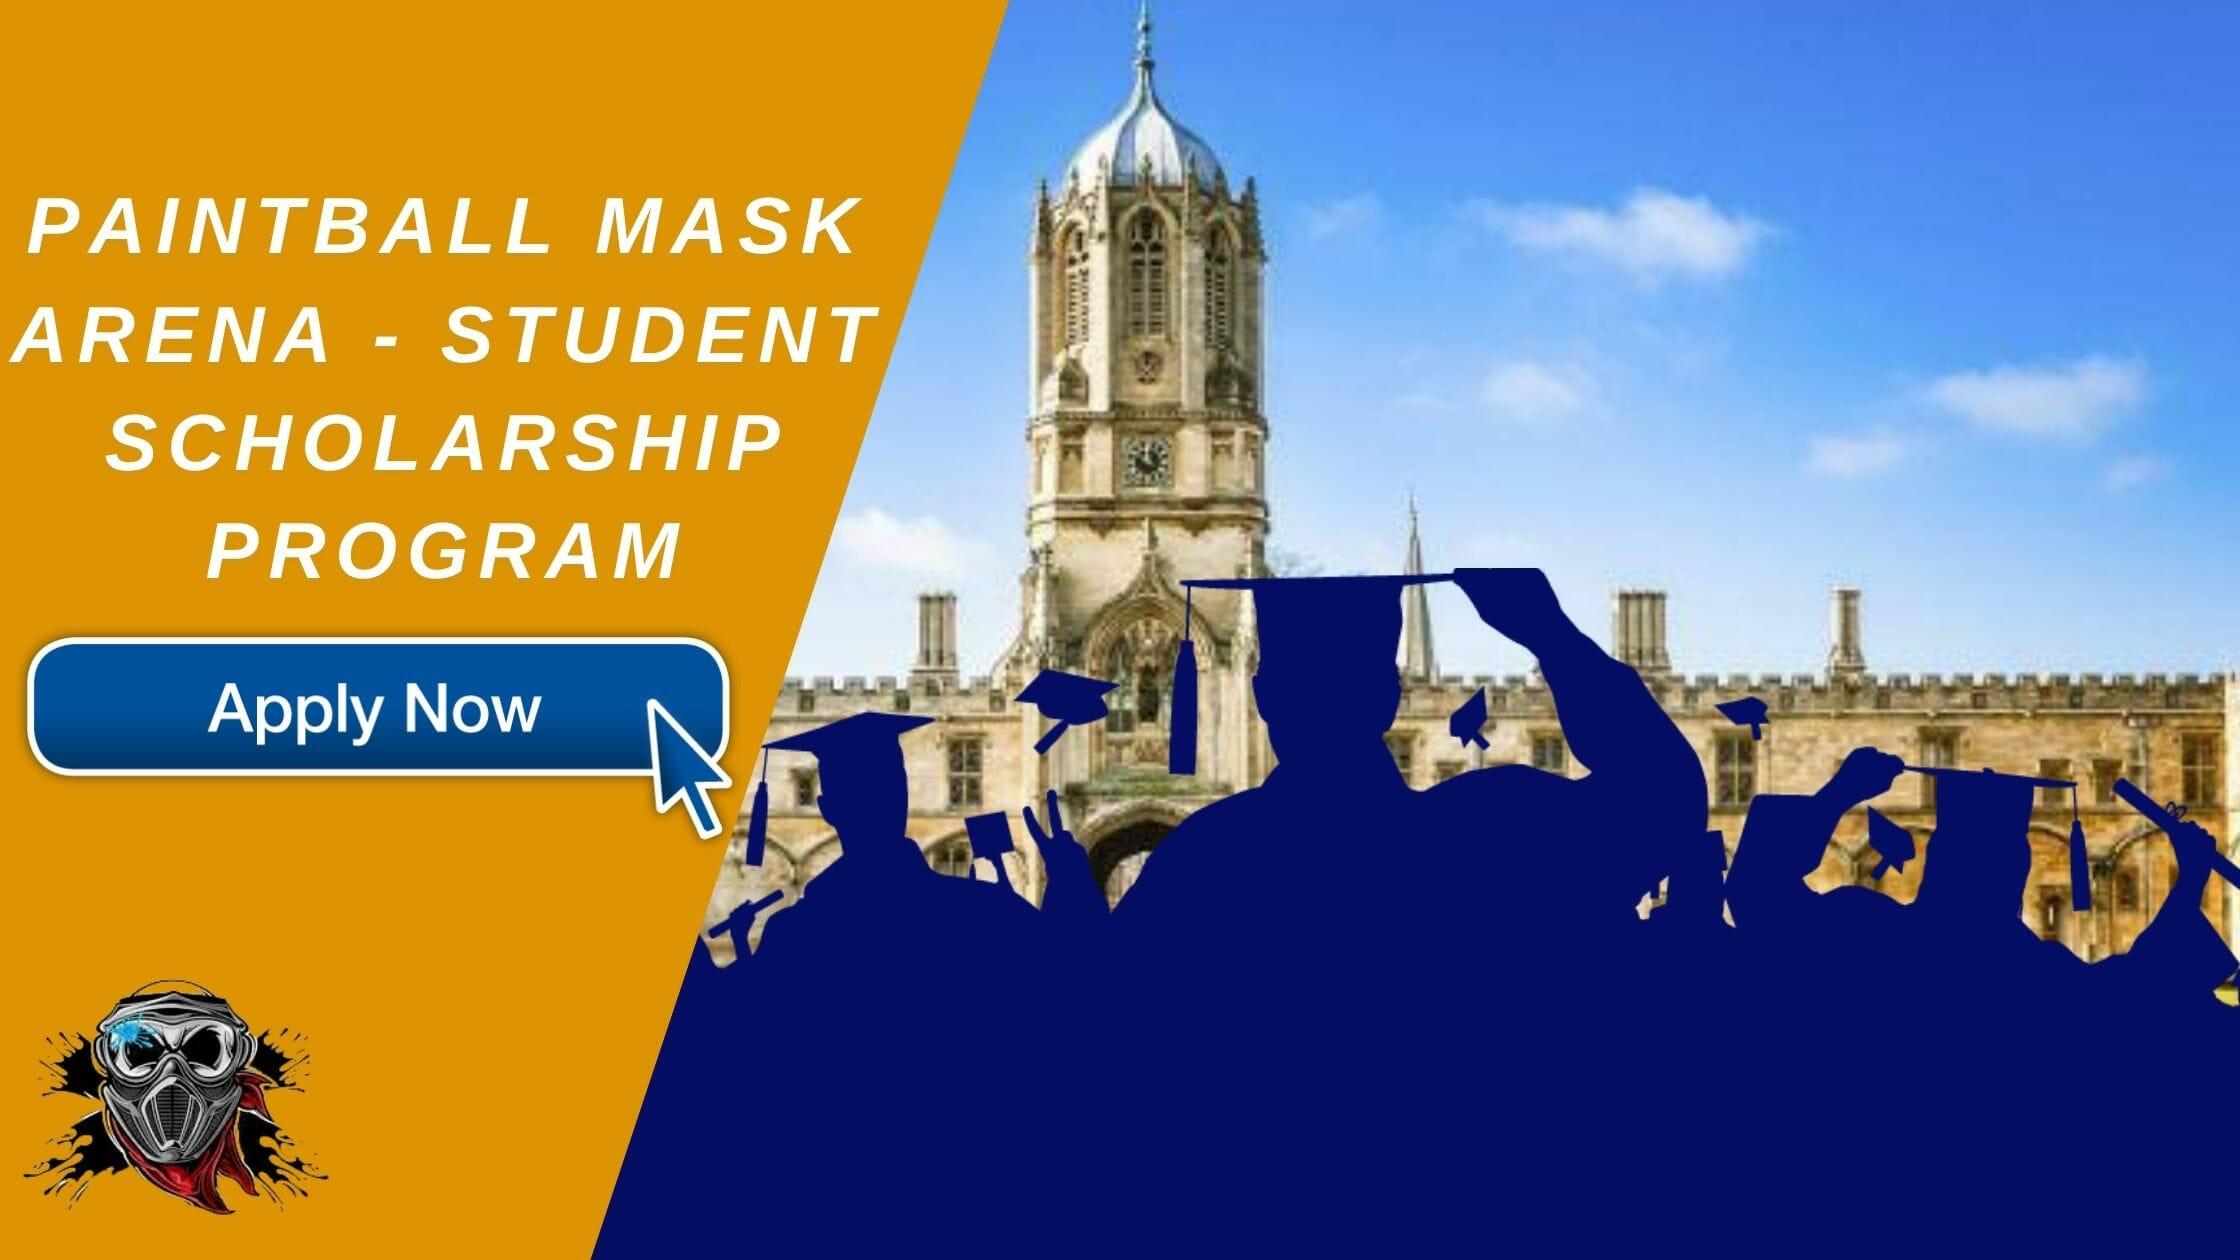 Paintball Mask arena - Student Scholarship Program